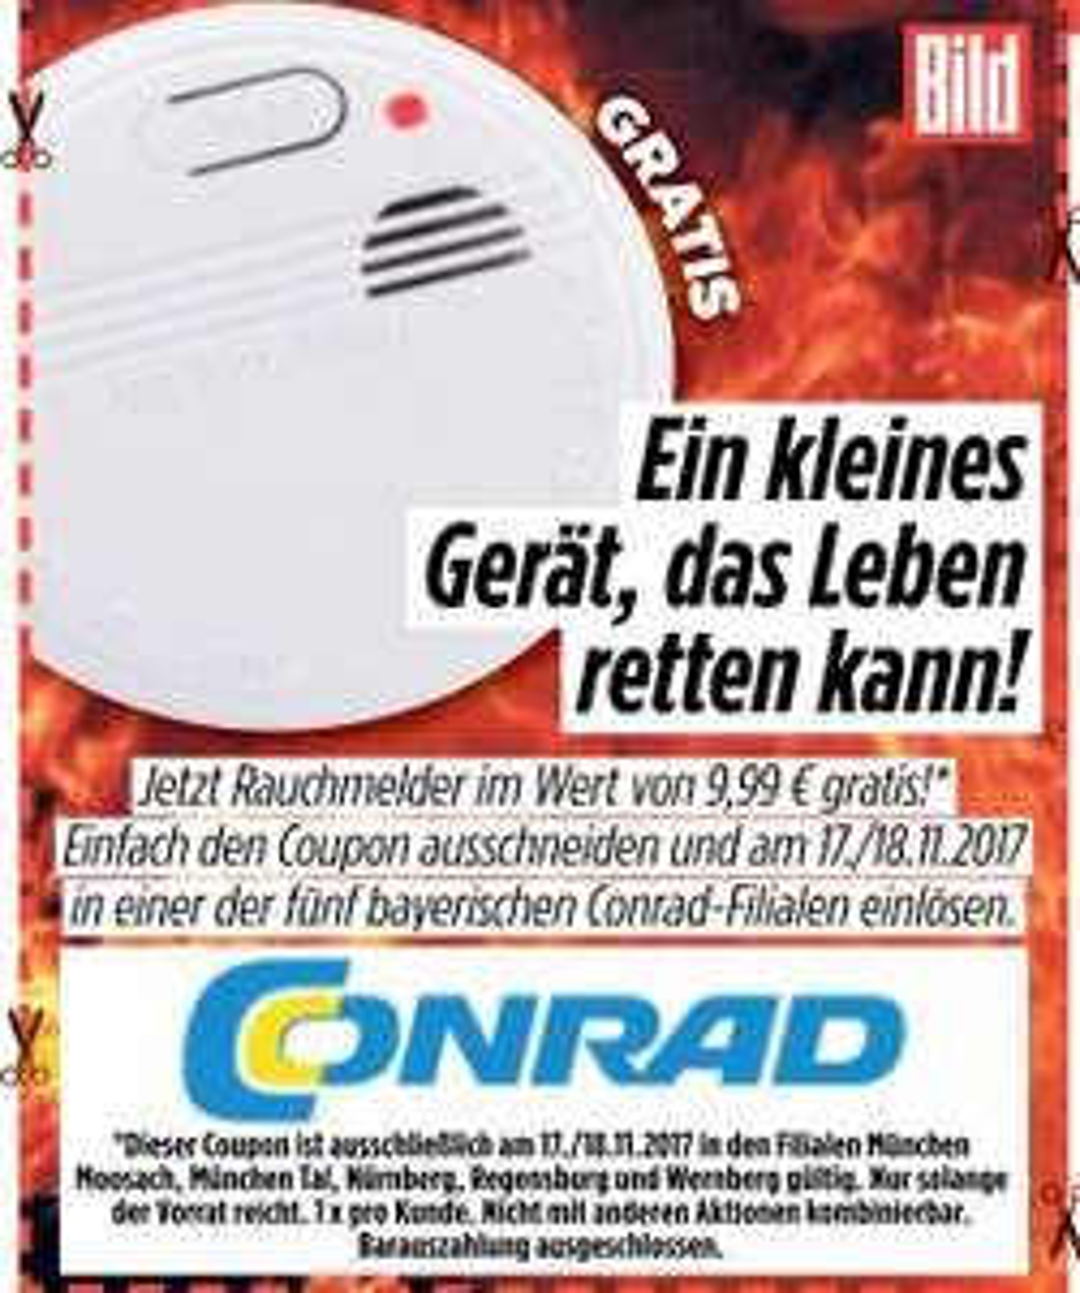 [Lokal] Gratis Rauchmelder / Conrad Bayern